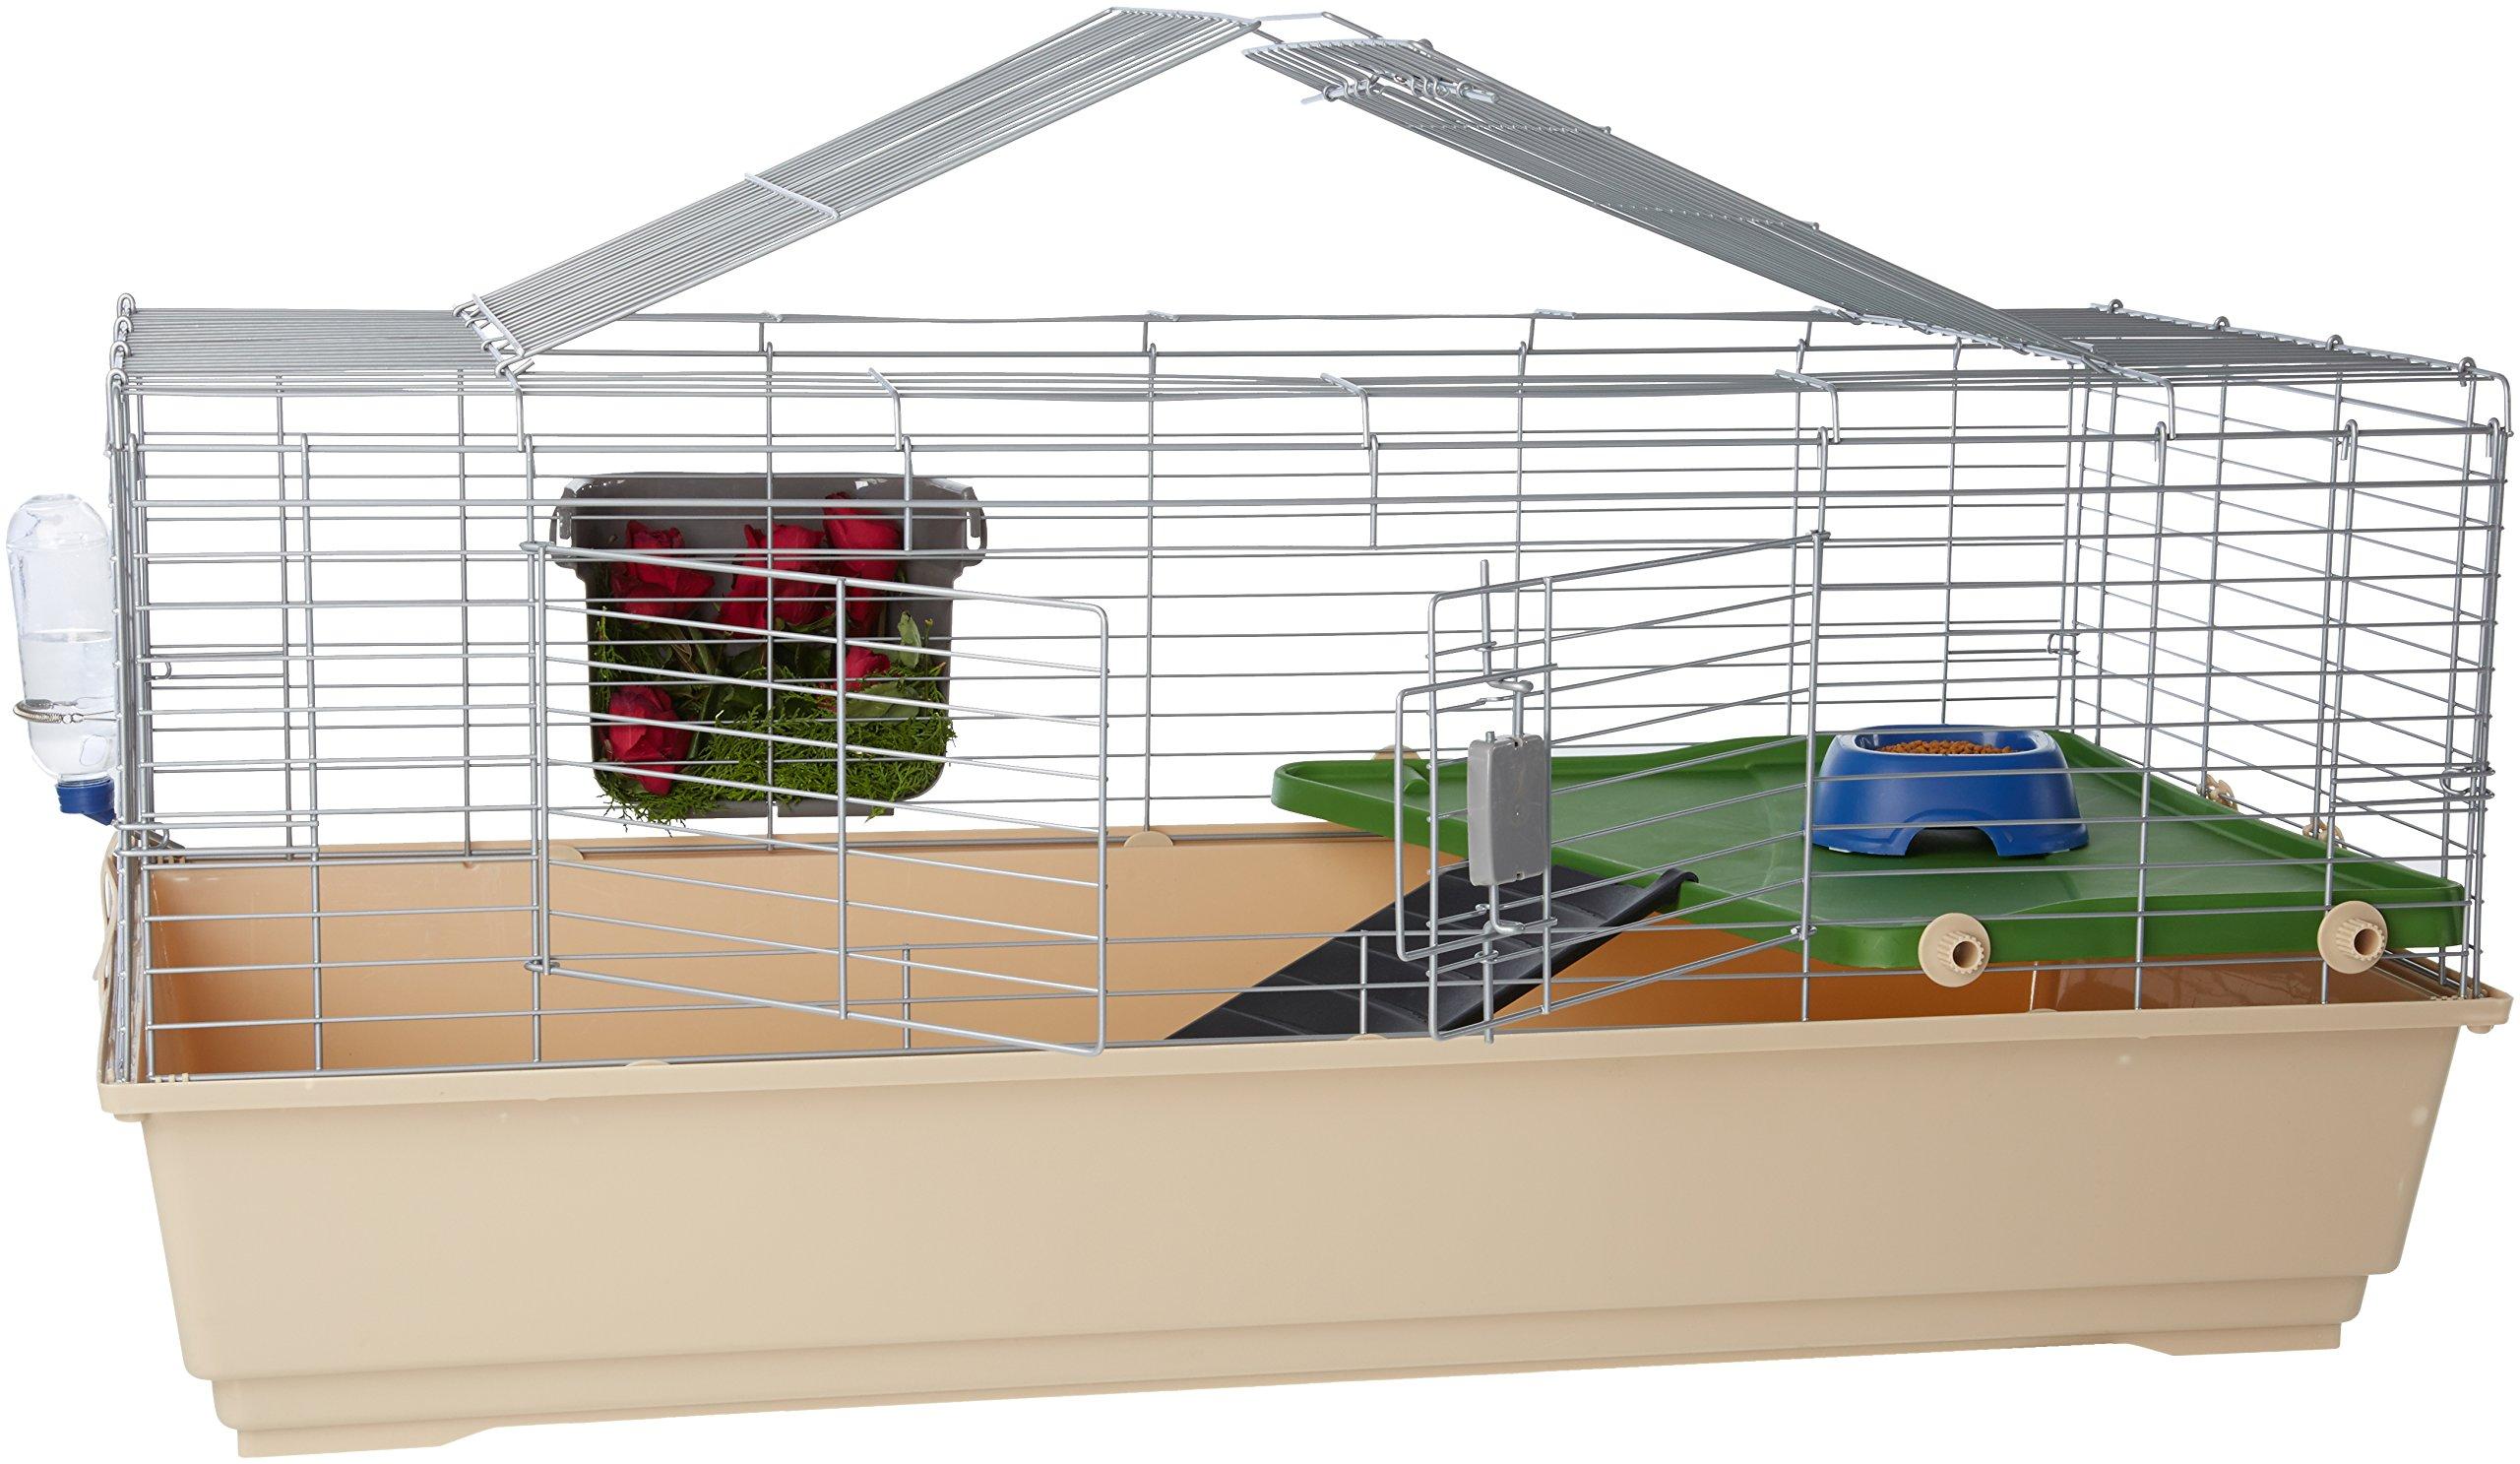 AmazonBasics Small Animal Cage Habitat With Accessories - 49 x 27 x 21 Inches, Jumbo by AmazonBasics